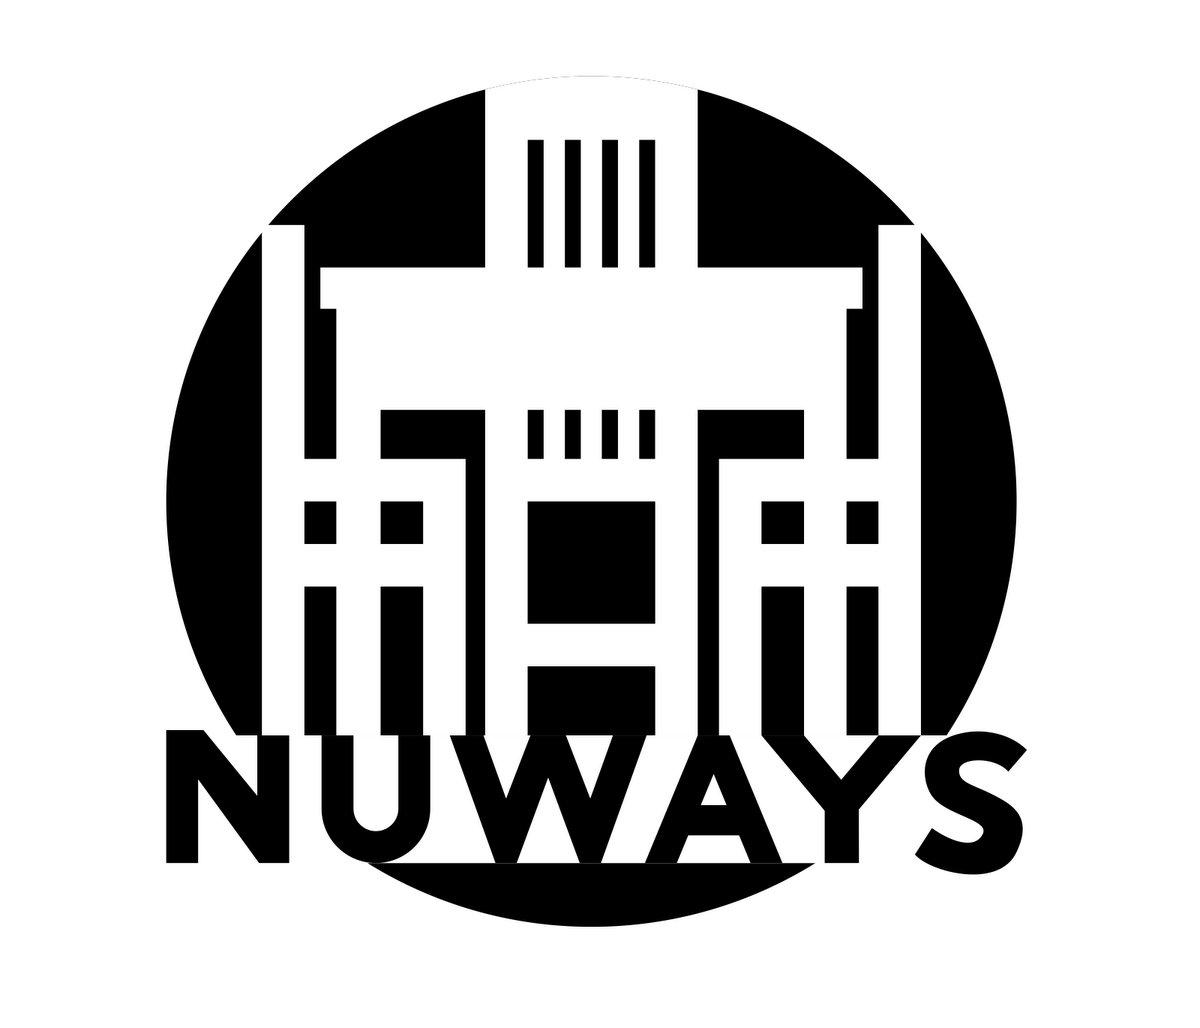 filenuways dollhouse furniture logo monojpg the